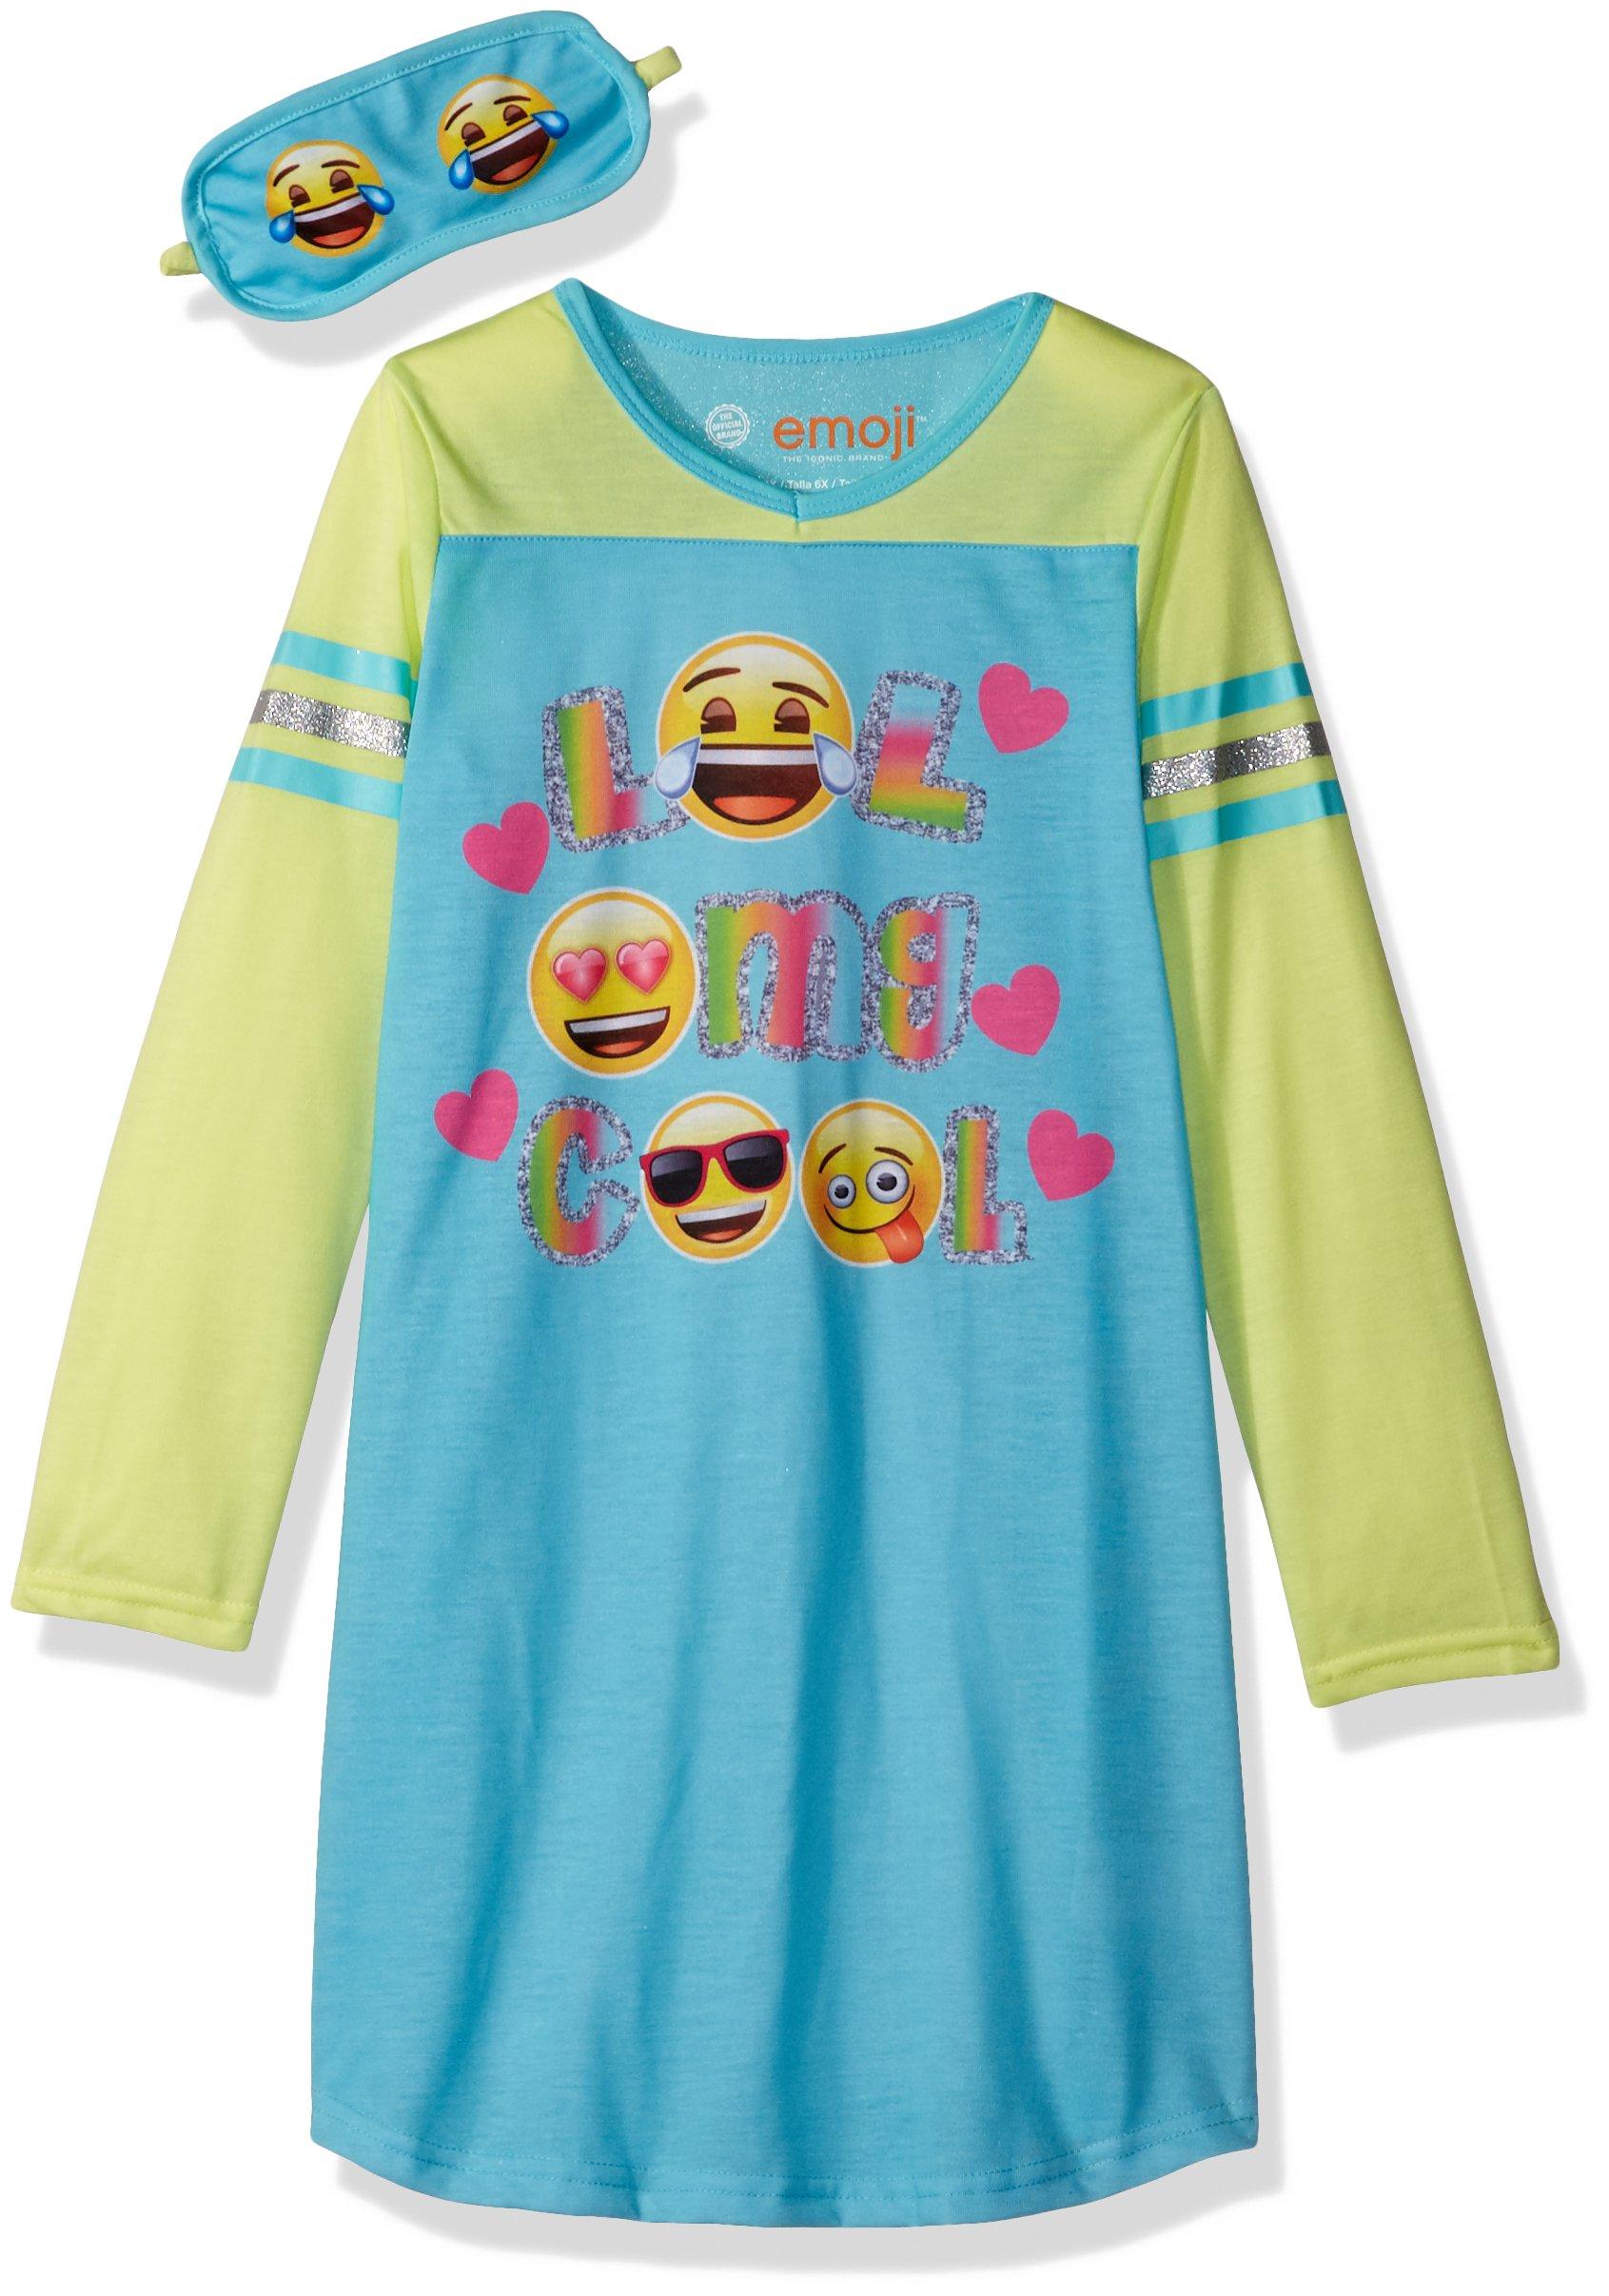 Bubblegum Divas Little Girls 4th of July Shirt Love Stars Patriotic Tank Top